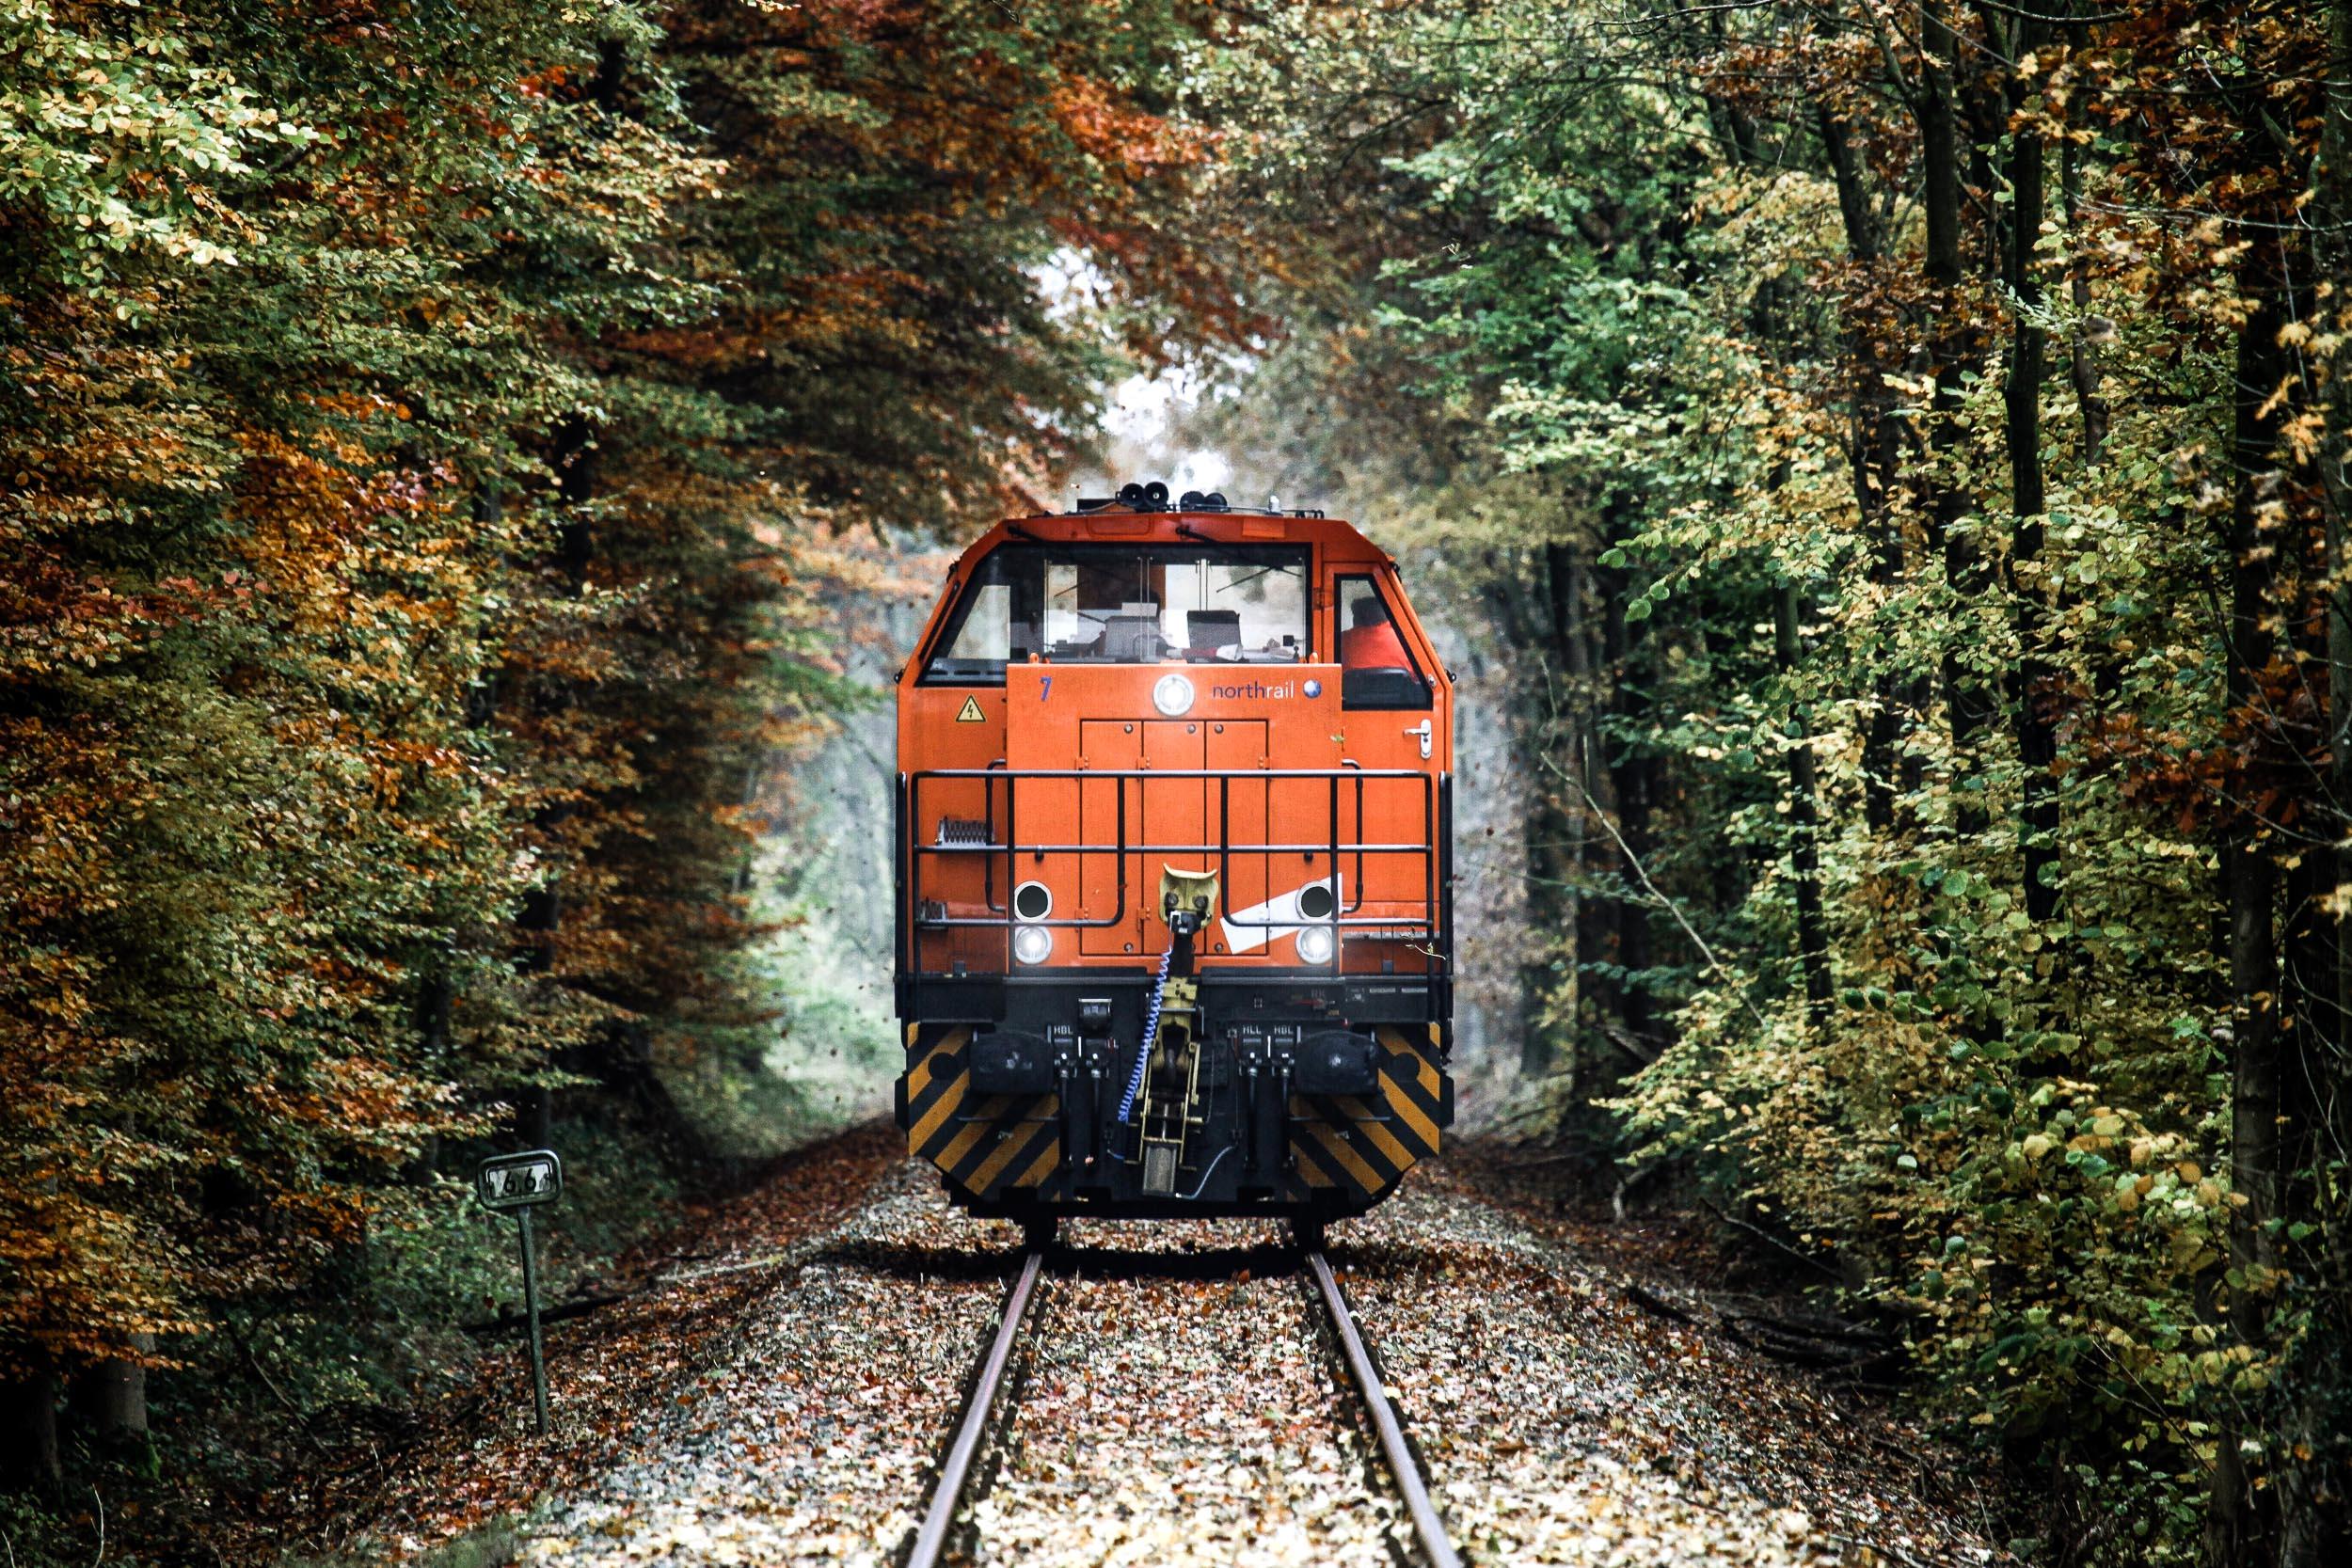 Paribus Rail Portfolio III - northrail-Lokomotive im Wald